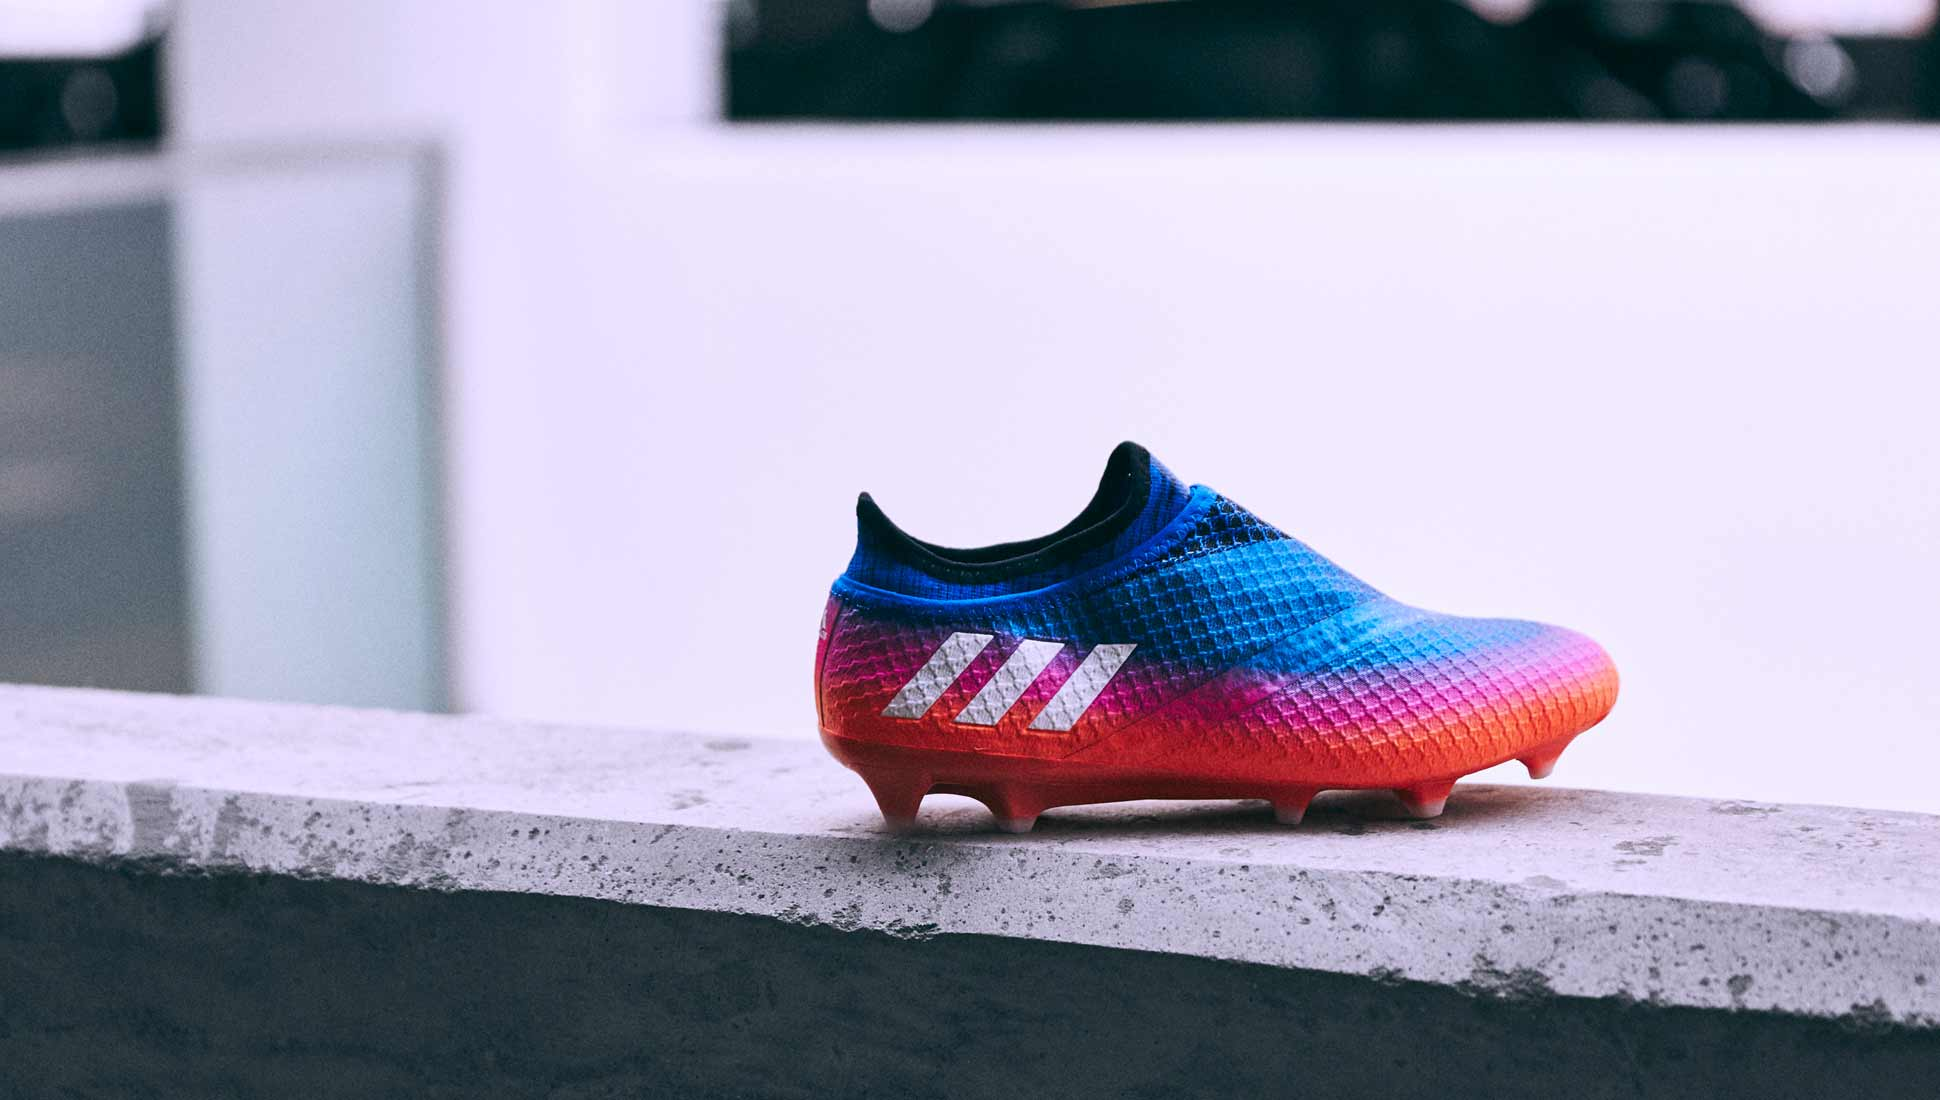 a039495af21 adidas Messi 16+ Pureagility Football Boots - SoccerBible